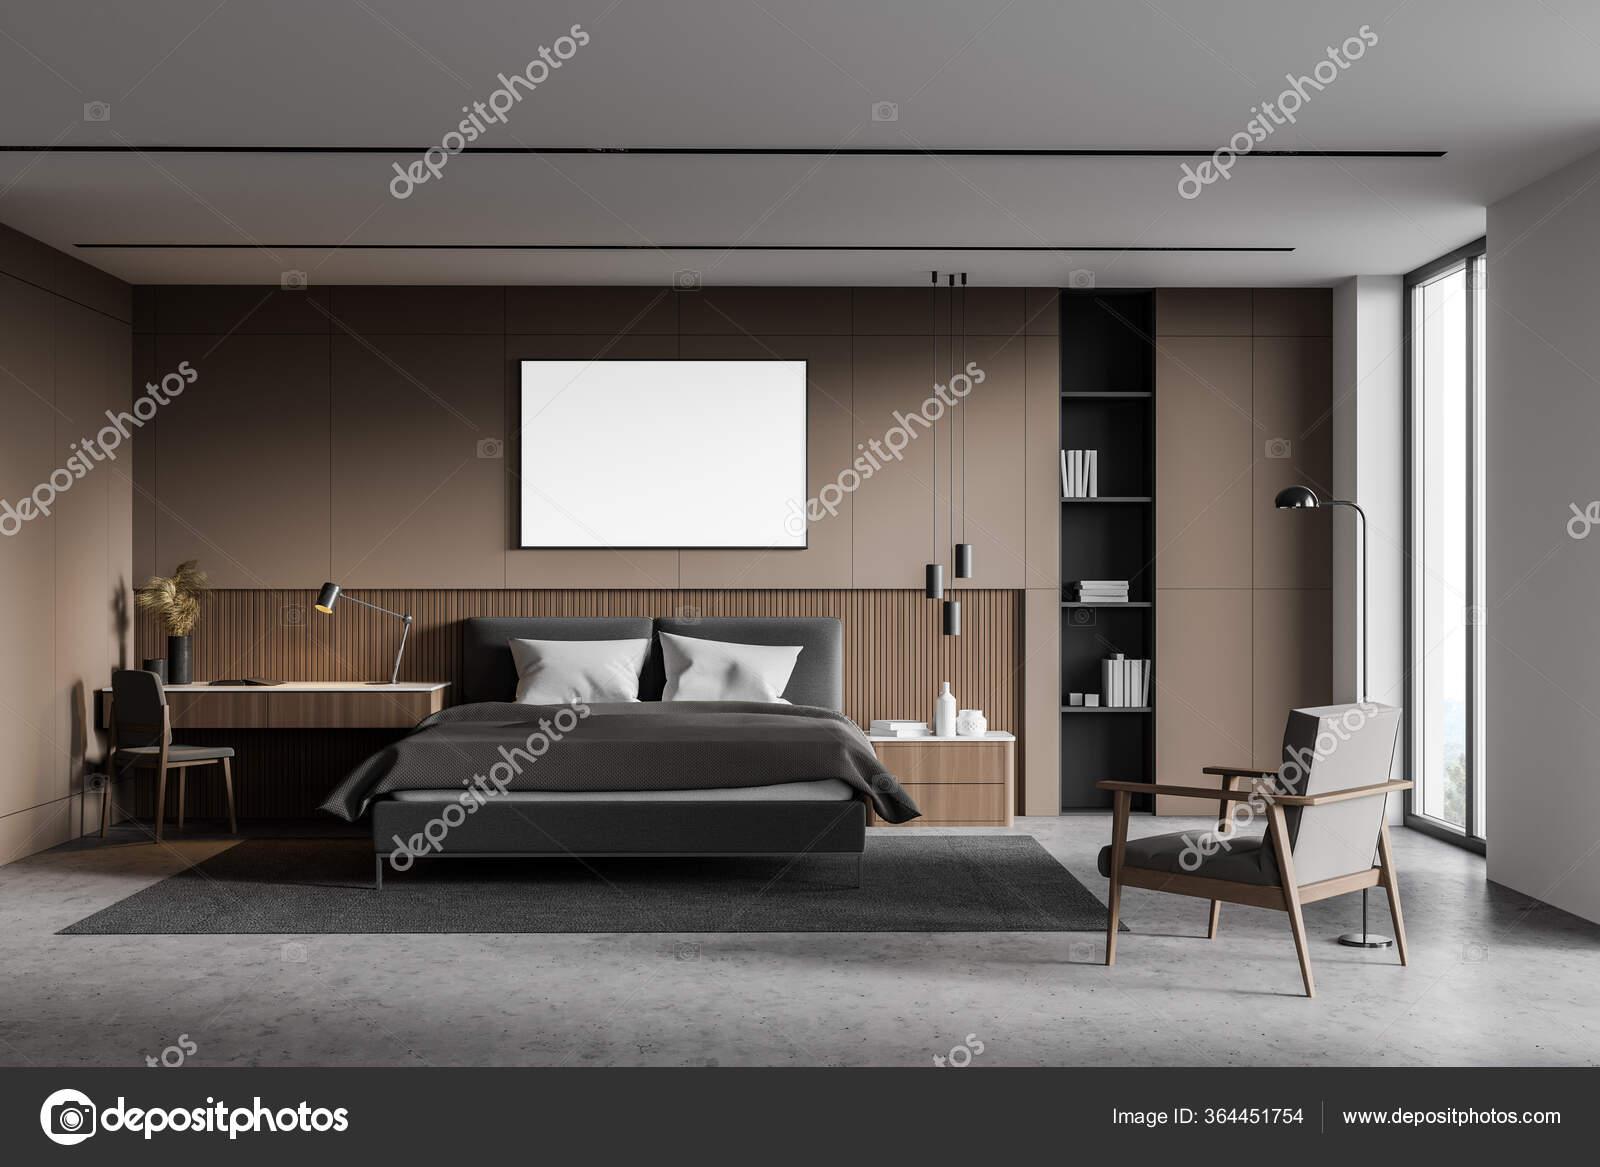 Interior Master Bedroom Beige White Walls Concrete Floor Cozy King Stock Photo C Denisismagilov 364451754